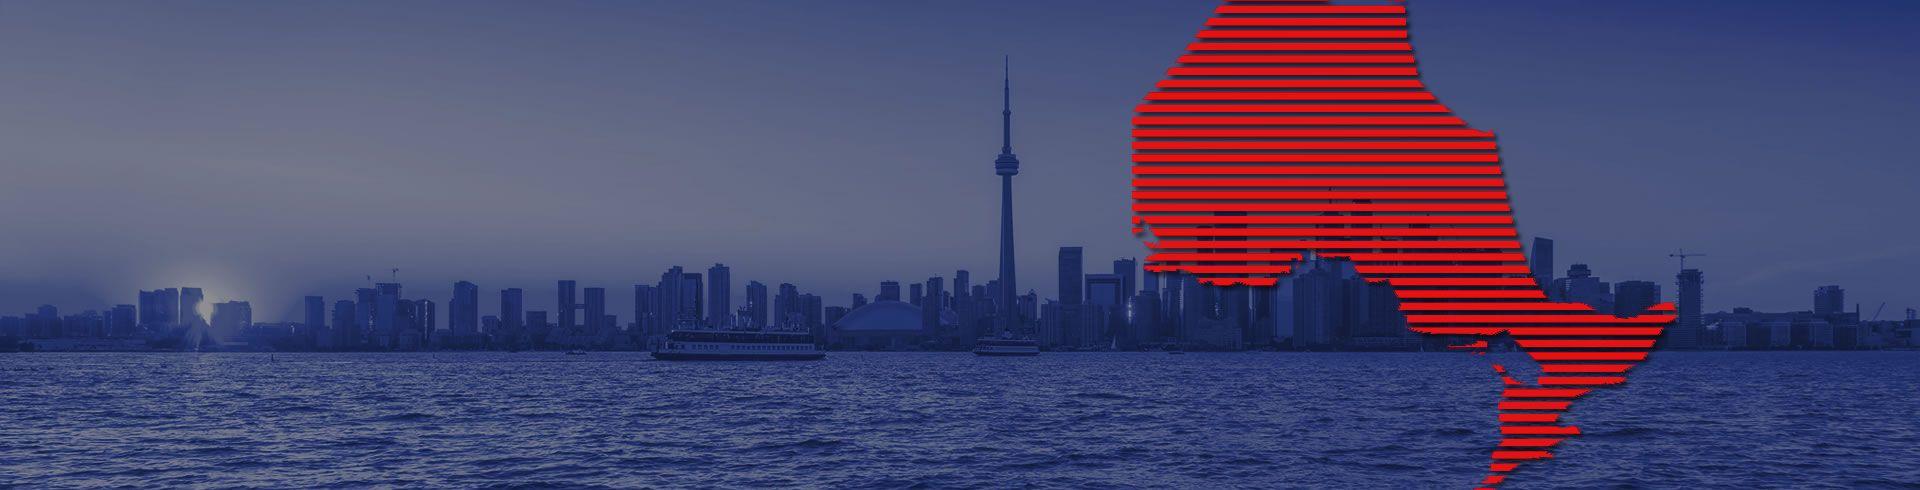 Programs - Toronto Skyline